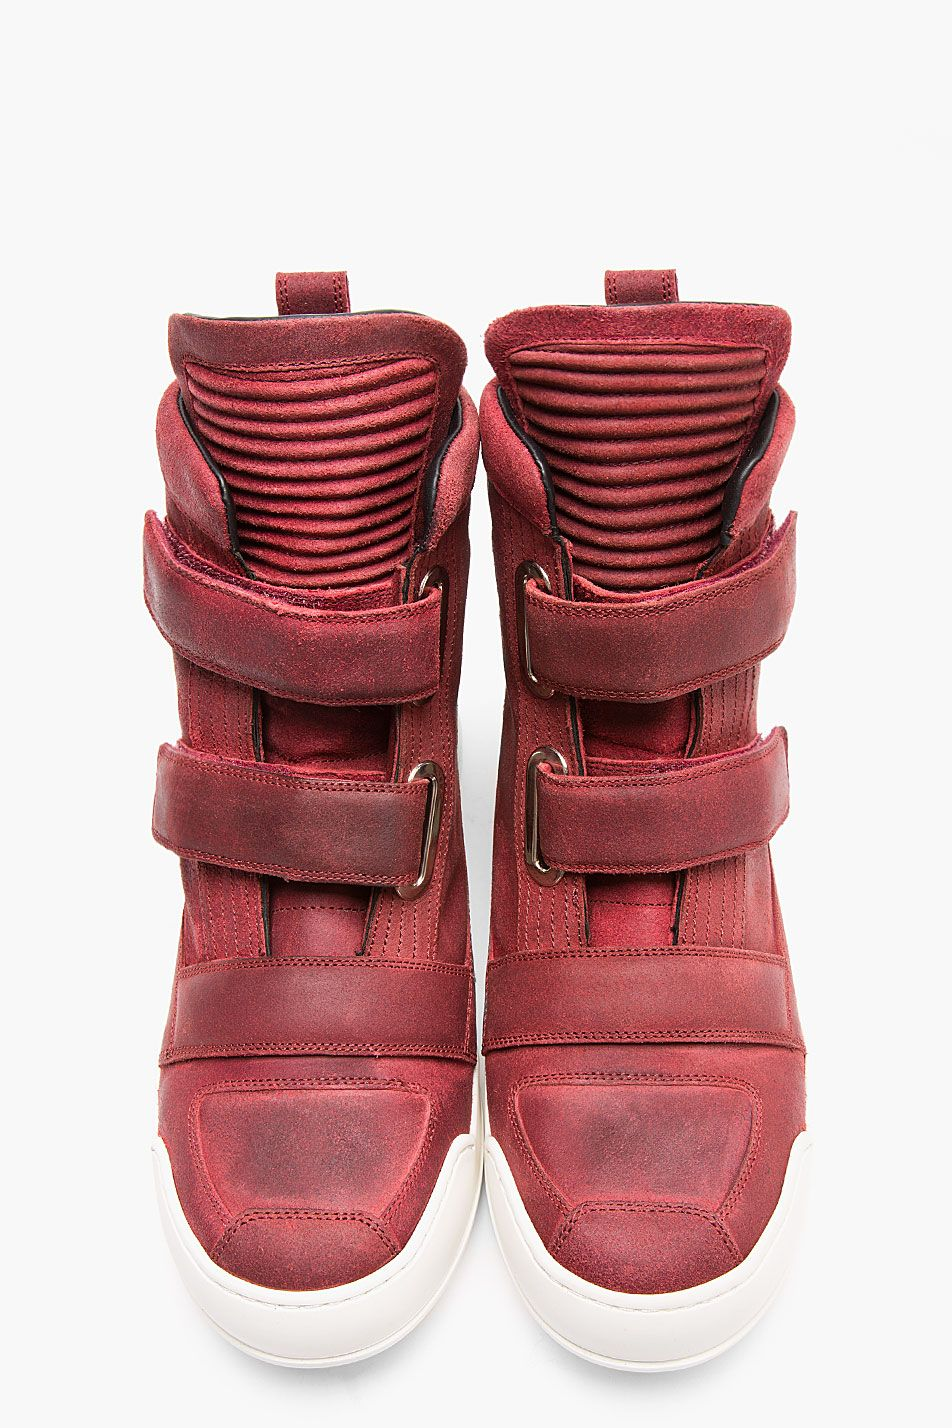 56250c8a62 Balmain Red Suede Velcro Biker High-top Sneakers for men | SSENSE ...